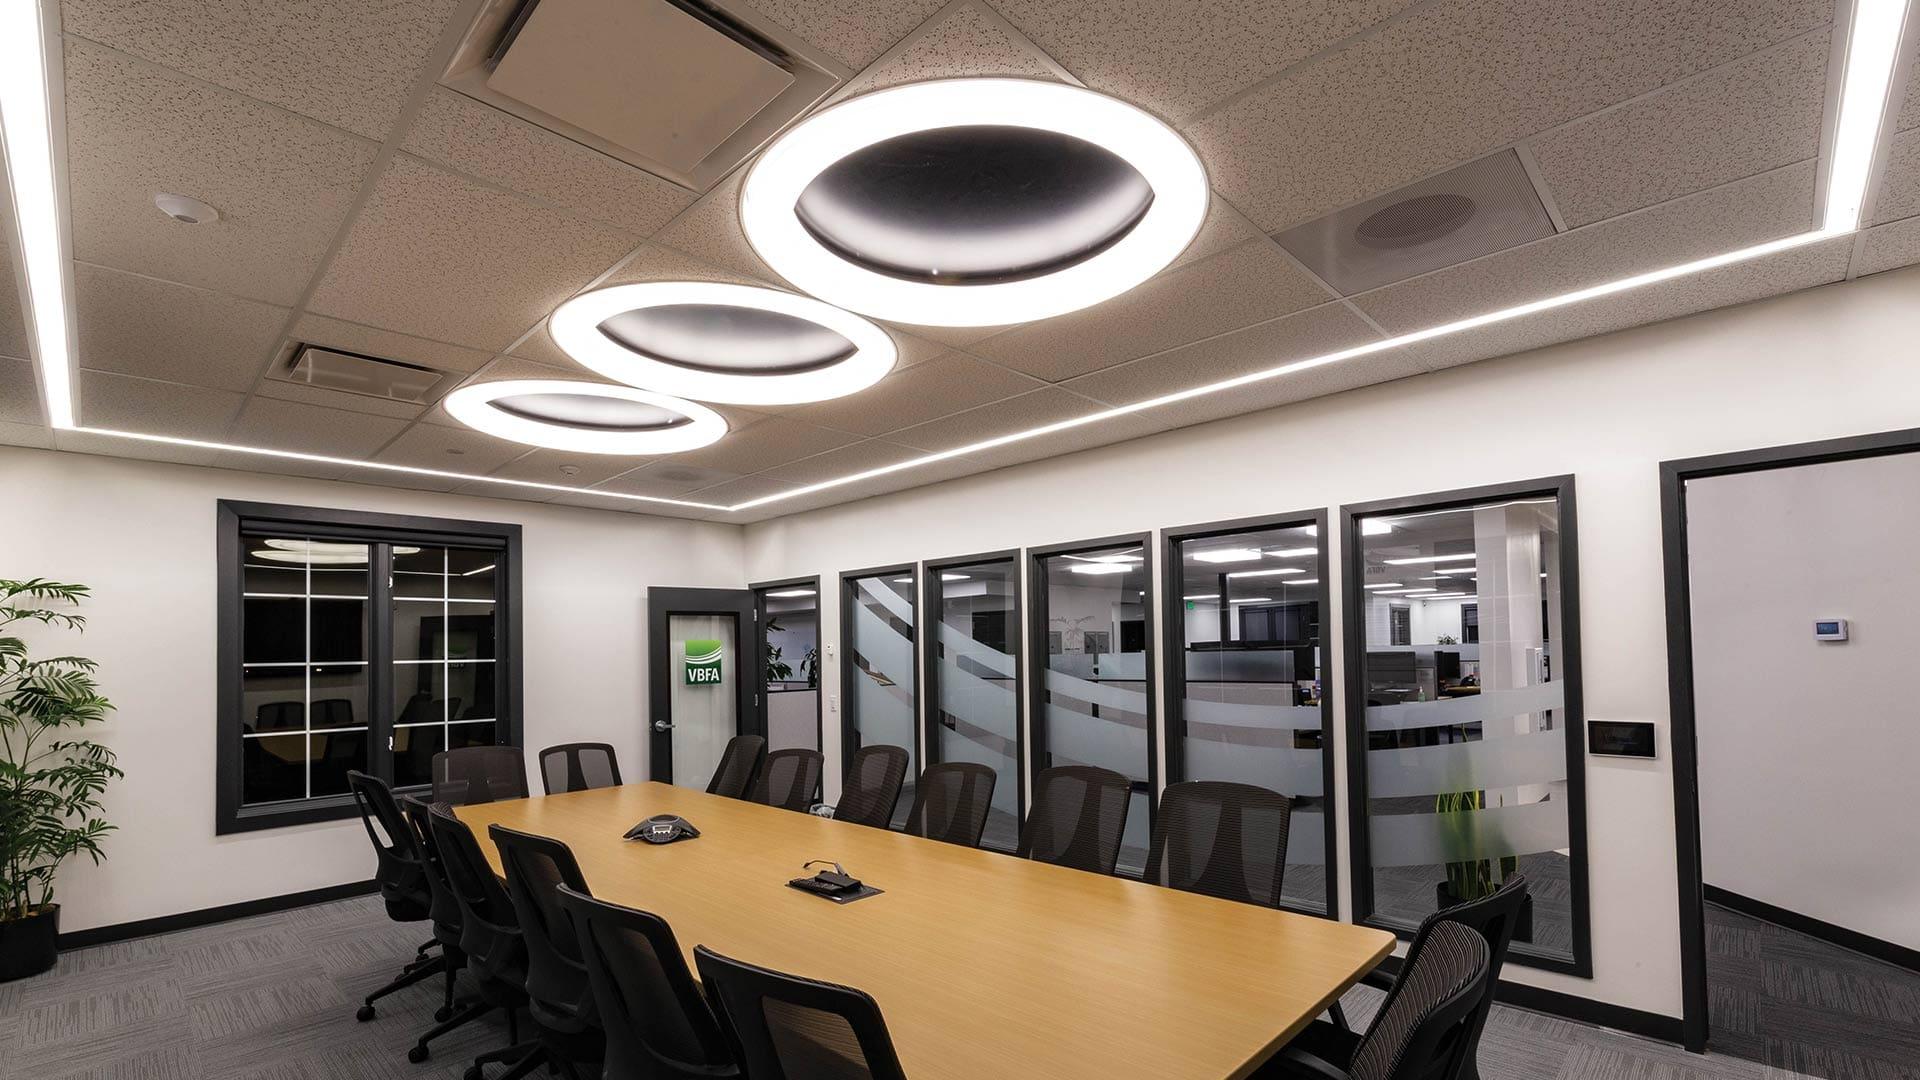 Mark Architectural VBFA Headquarters